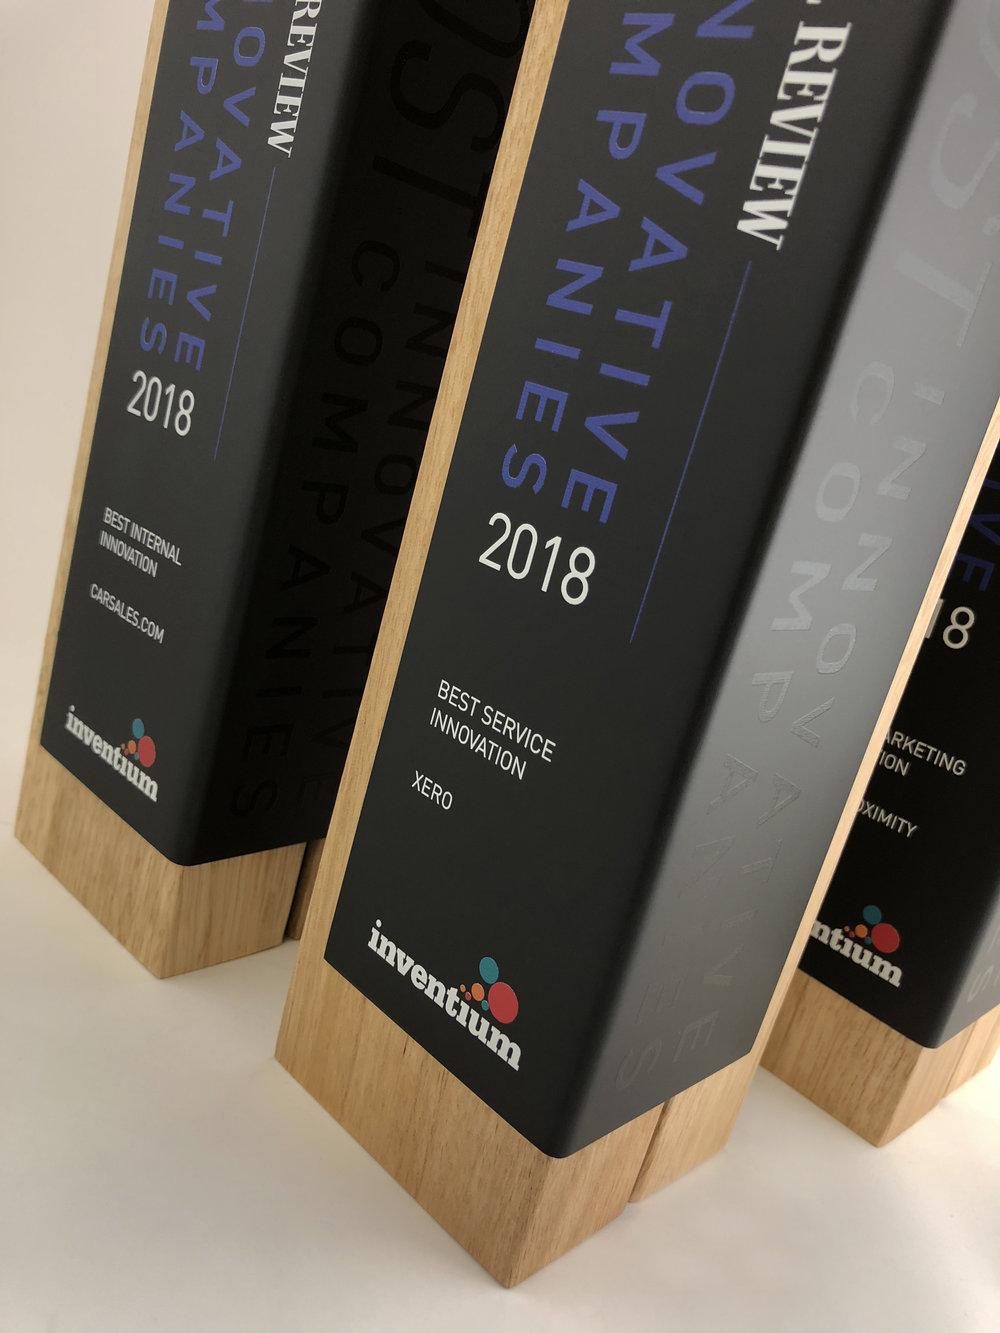 most-innovative-companies-awards-timber-metal-trophy-02.jpg